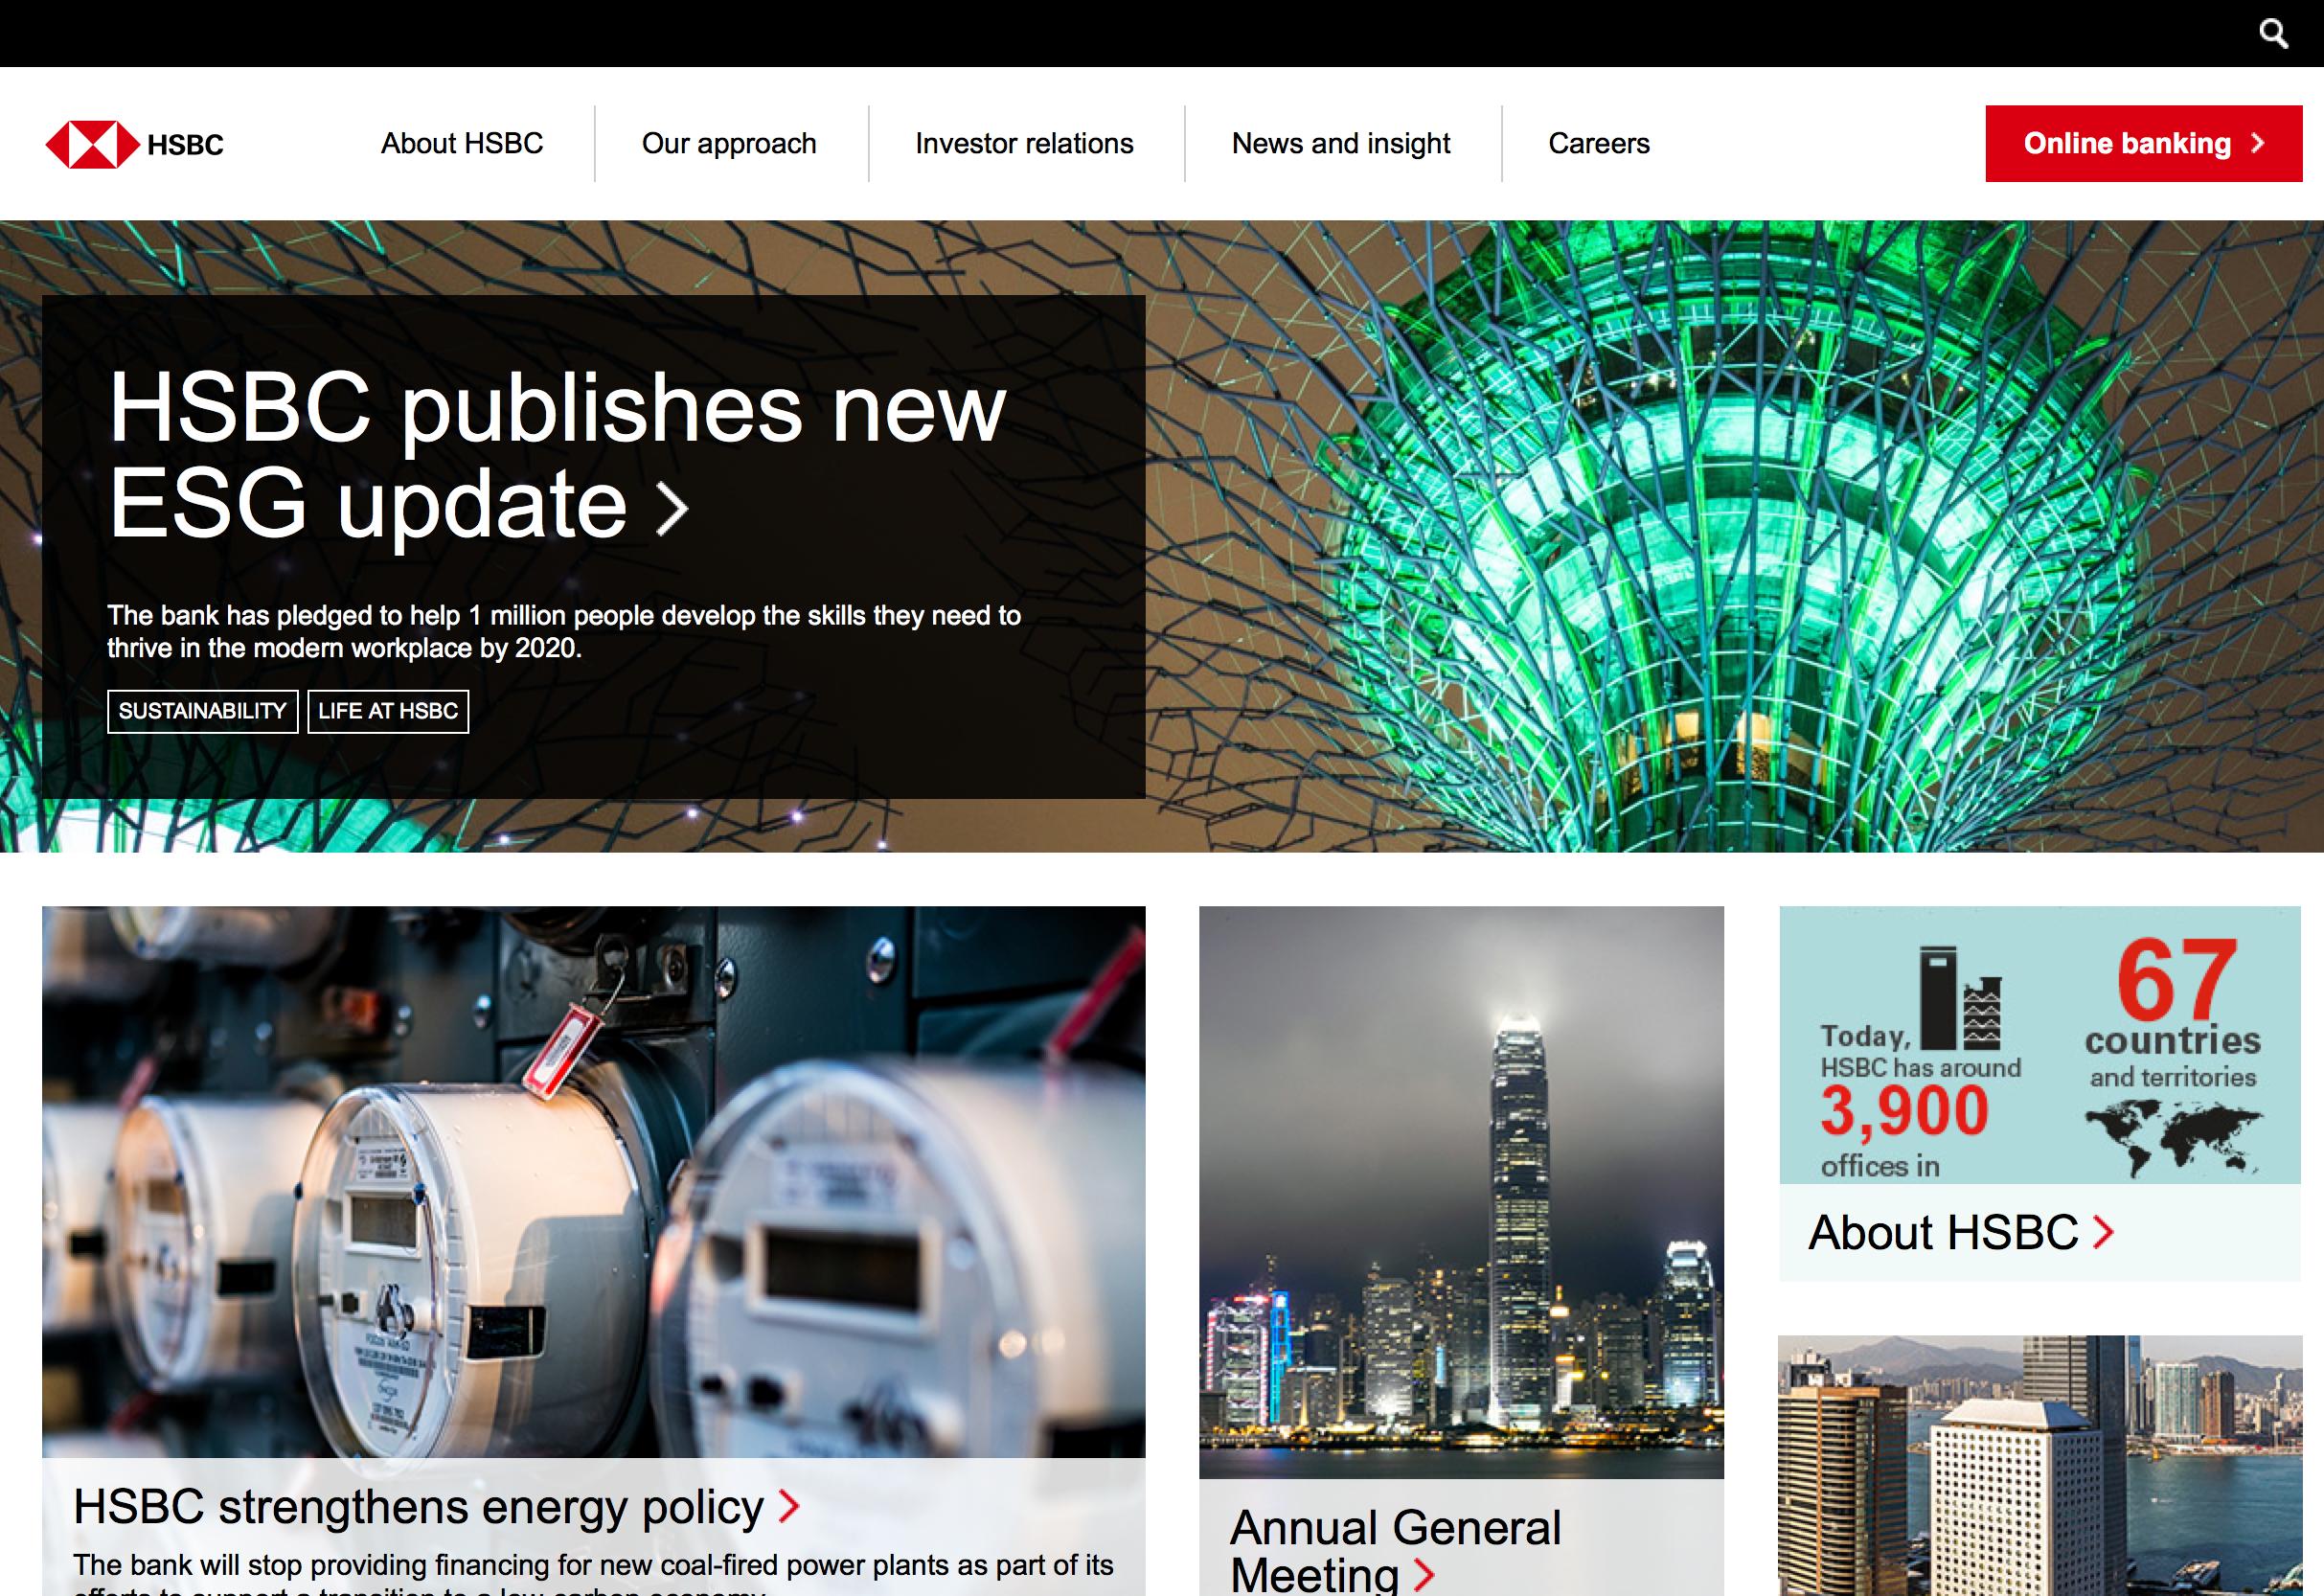 HSBC Website